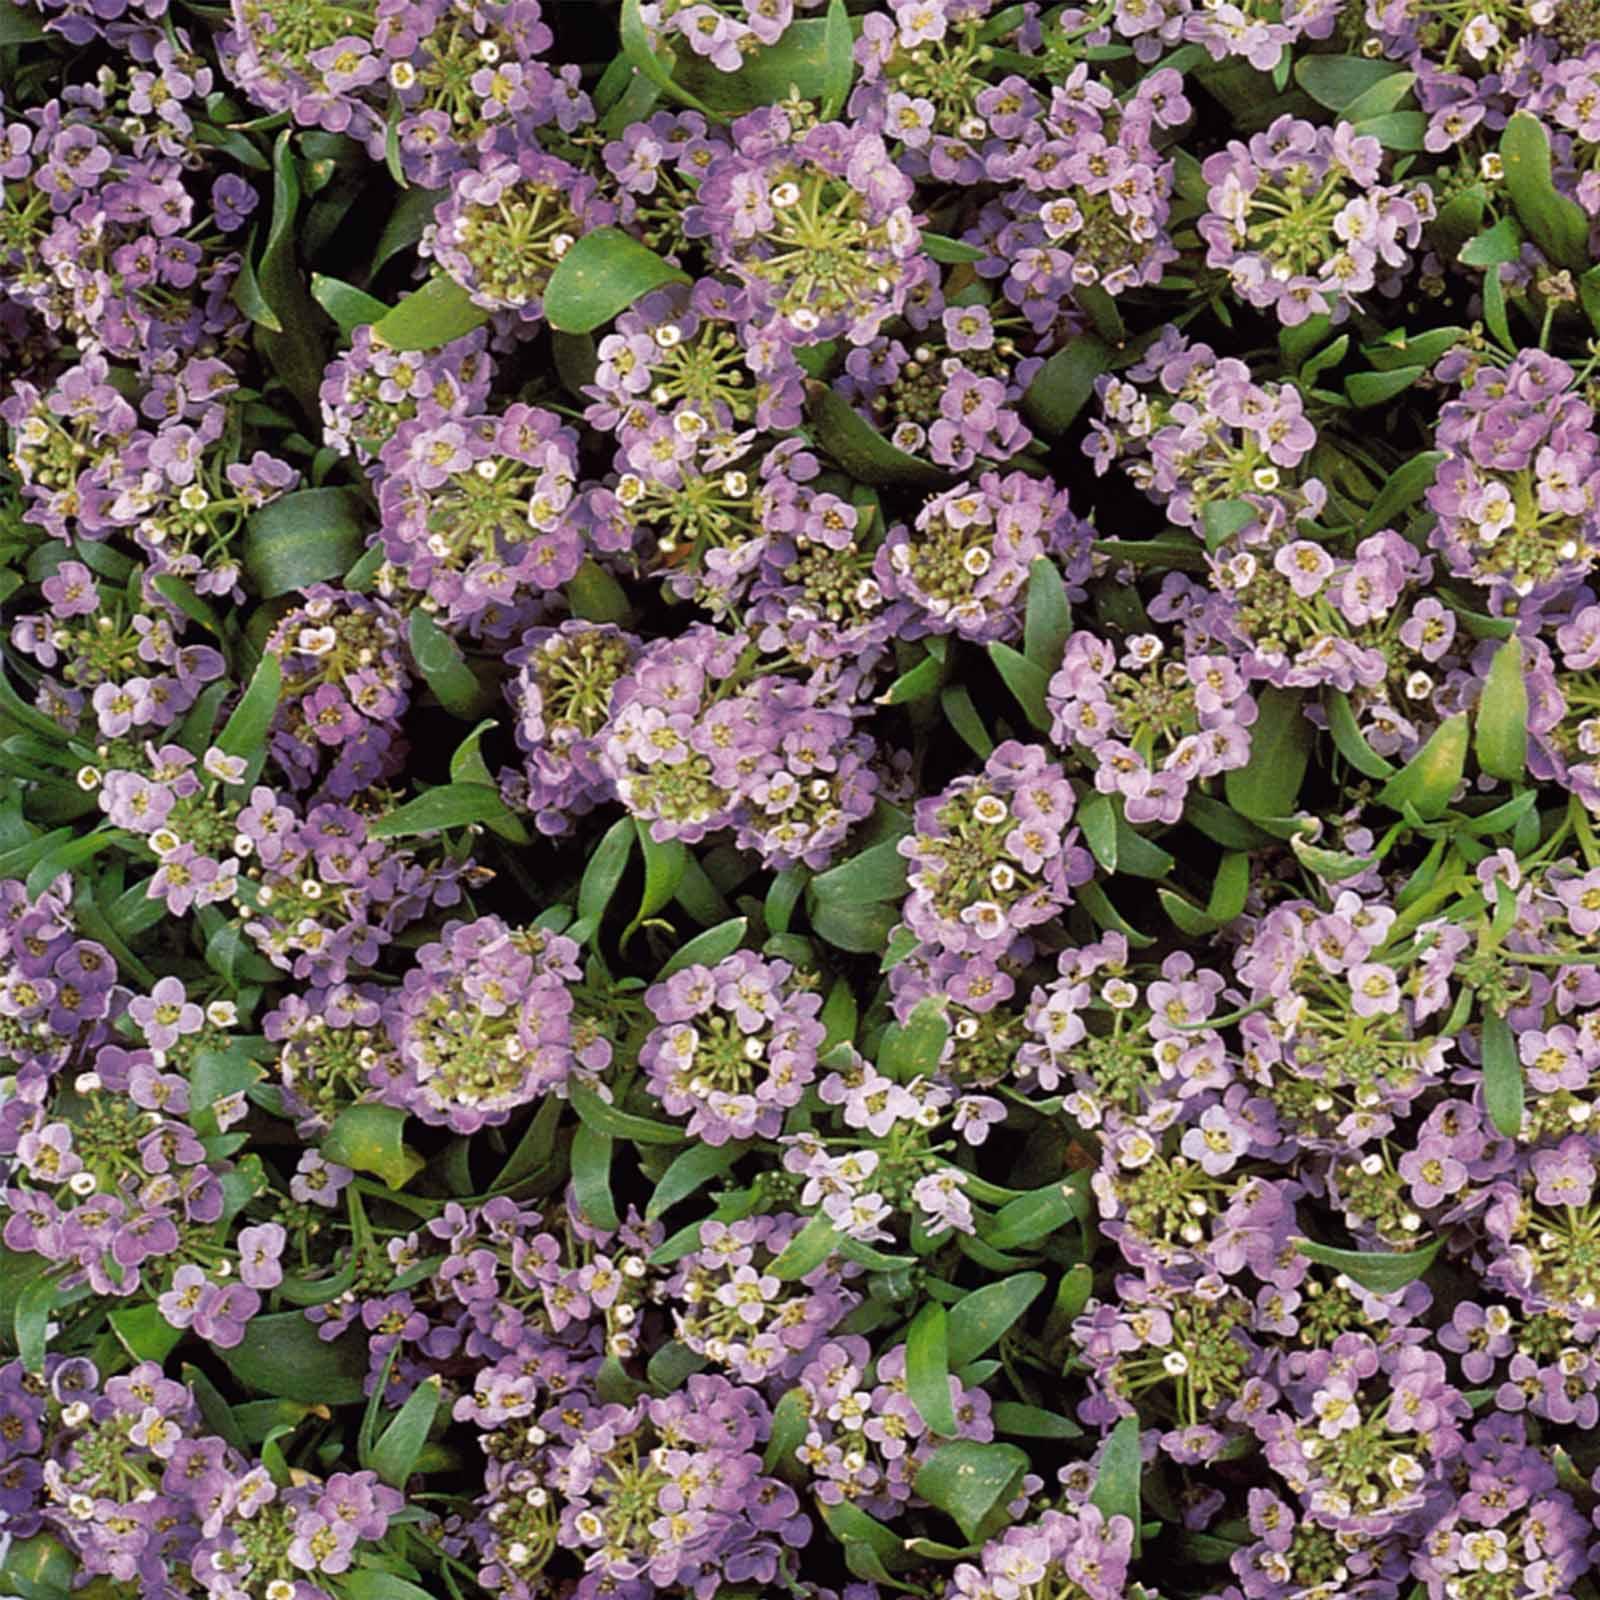 Alyssum Easter Bonnet Seeds - Color: Lavender - Approx 5000 Annual Flower Garden Seeds - Lobularia maritima